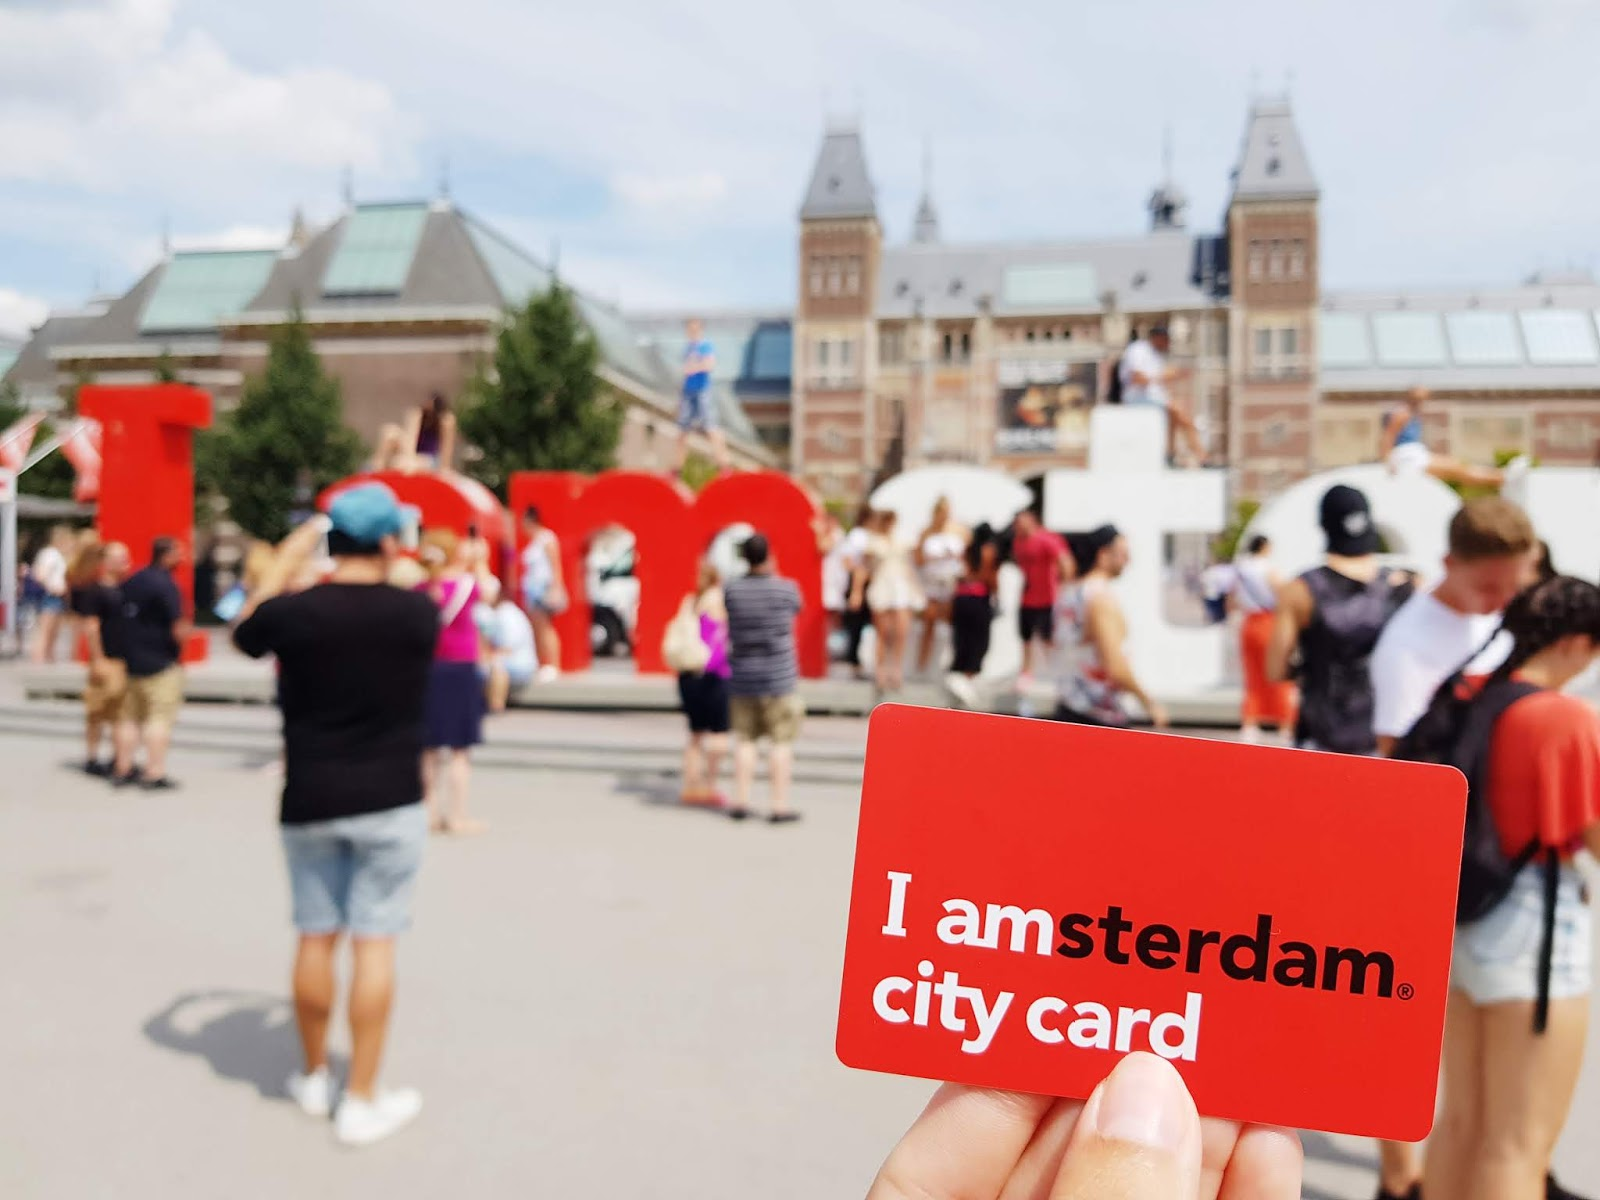 amsterdam iamsterdam letters rijksmuseum visit sightseeing